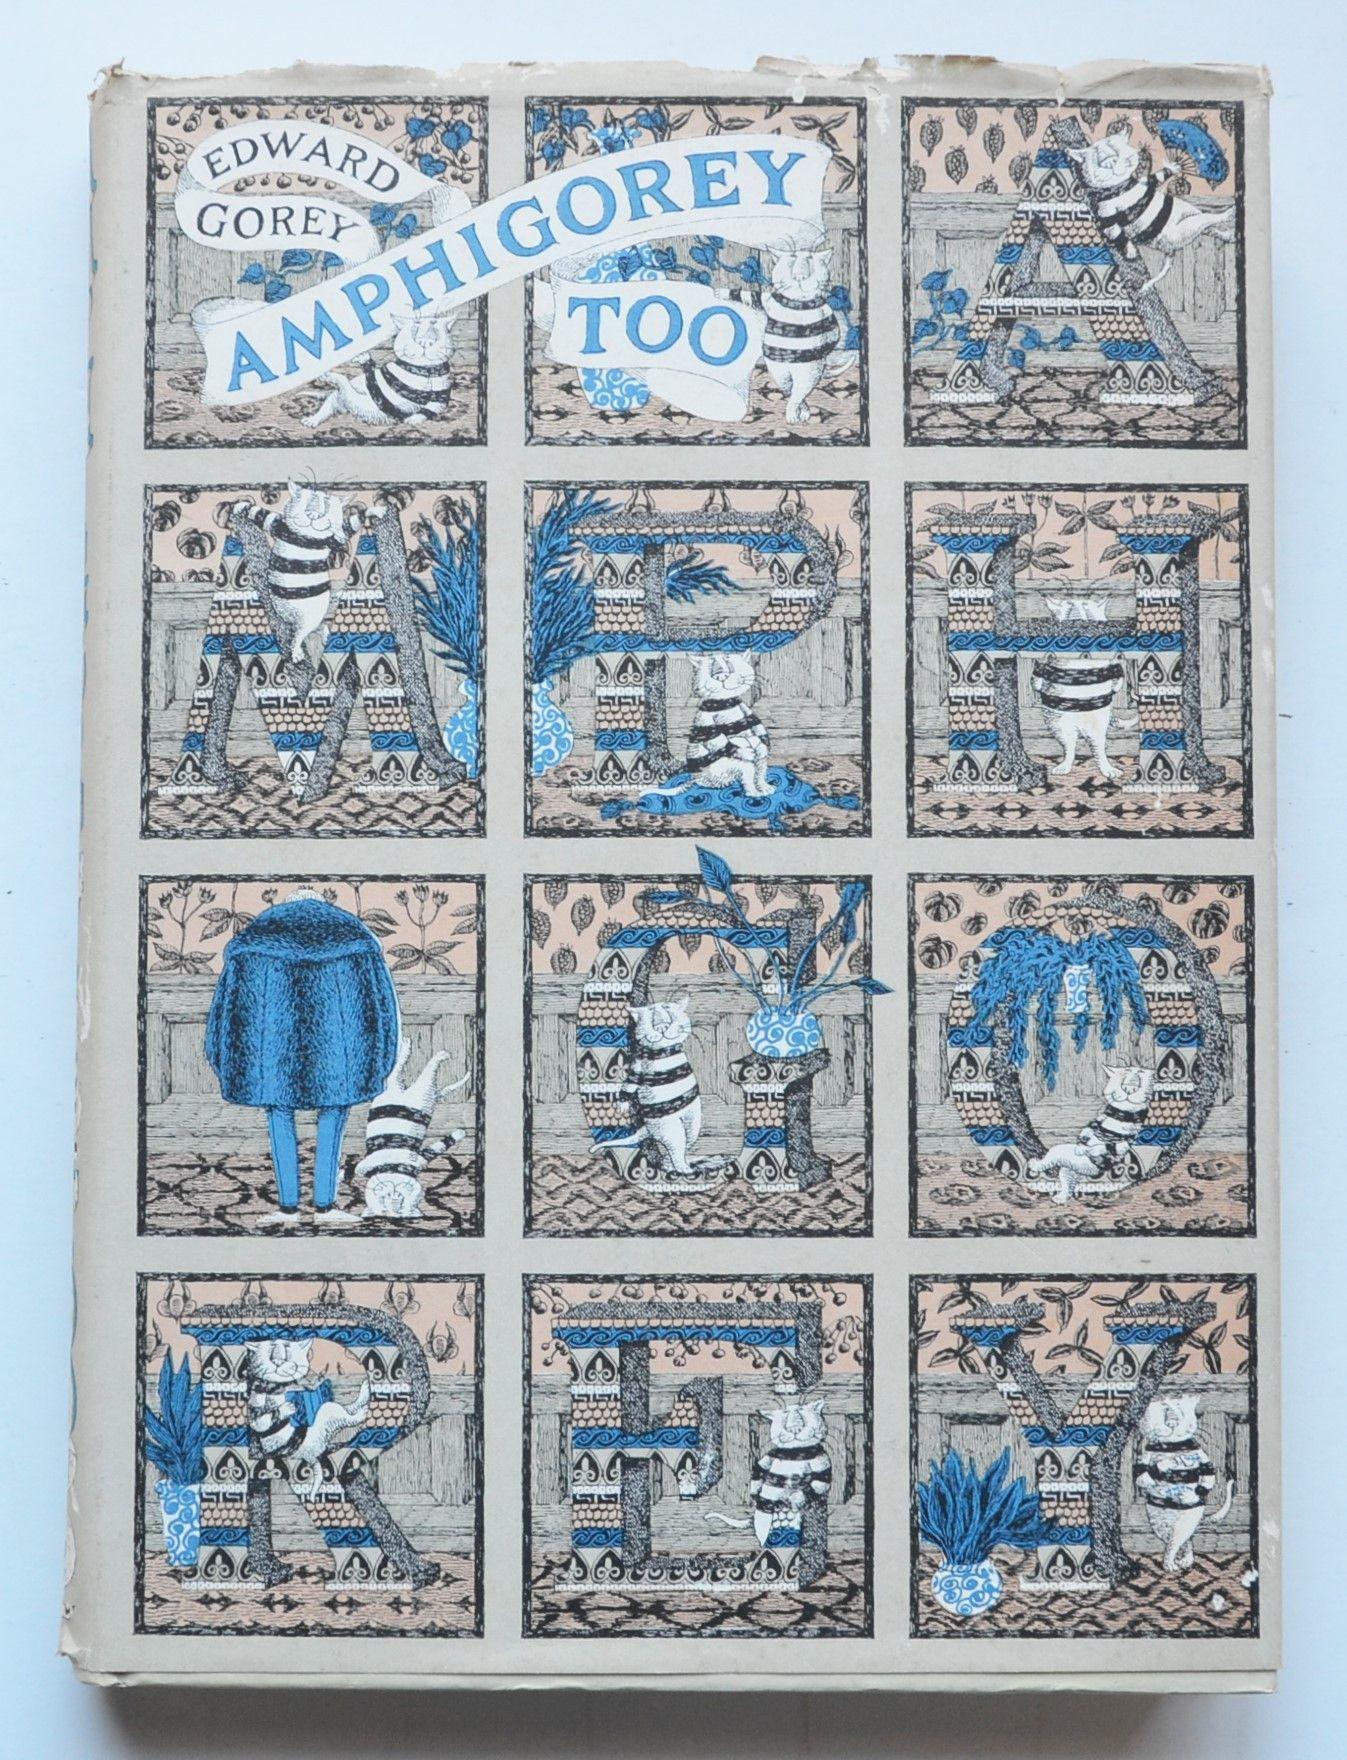 Amphigorey Too By Edward Gorey Edward Gorey Edward Gorey Books Favorite Books